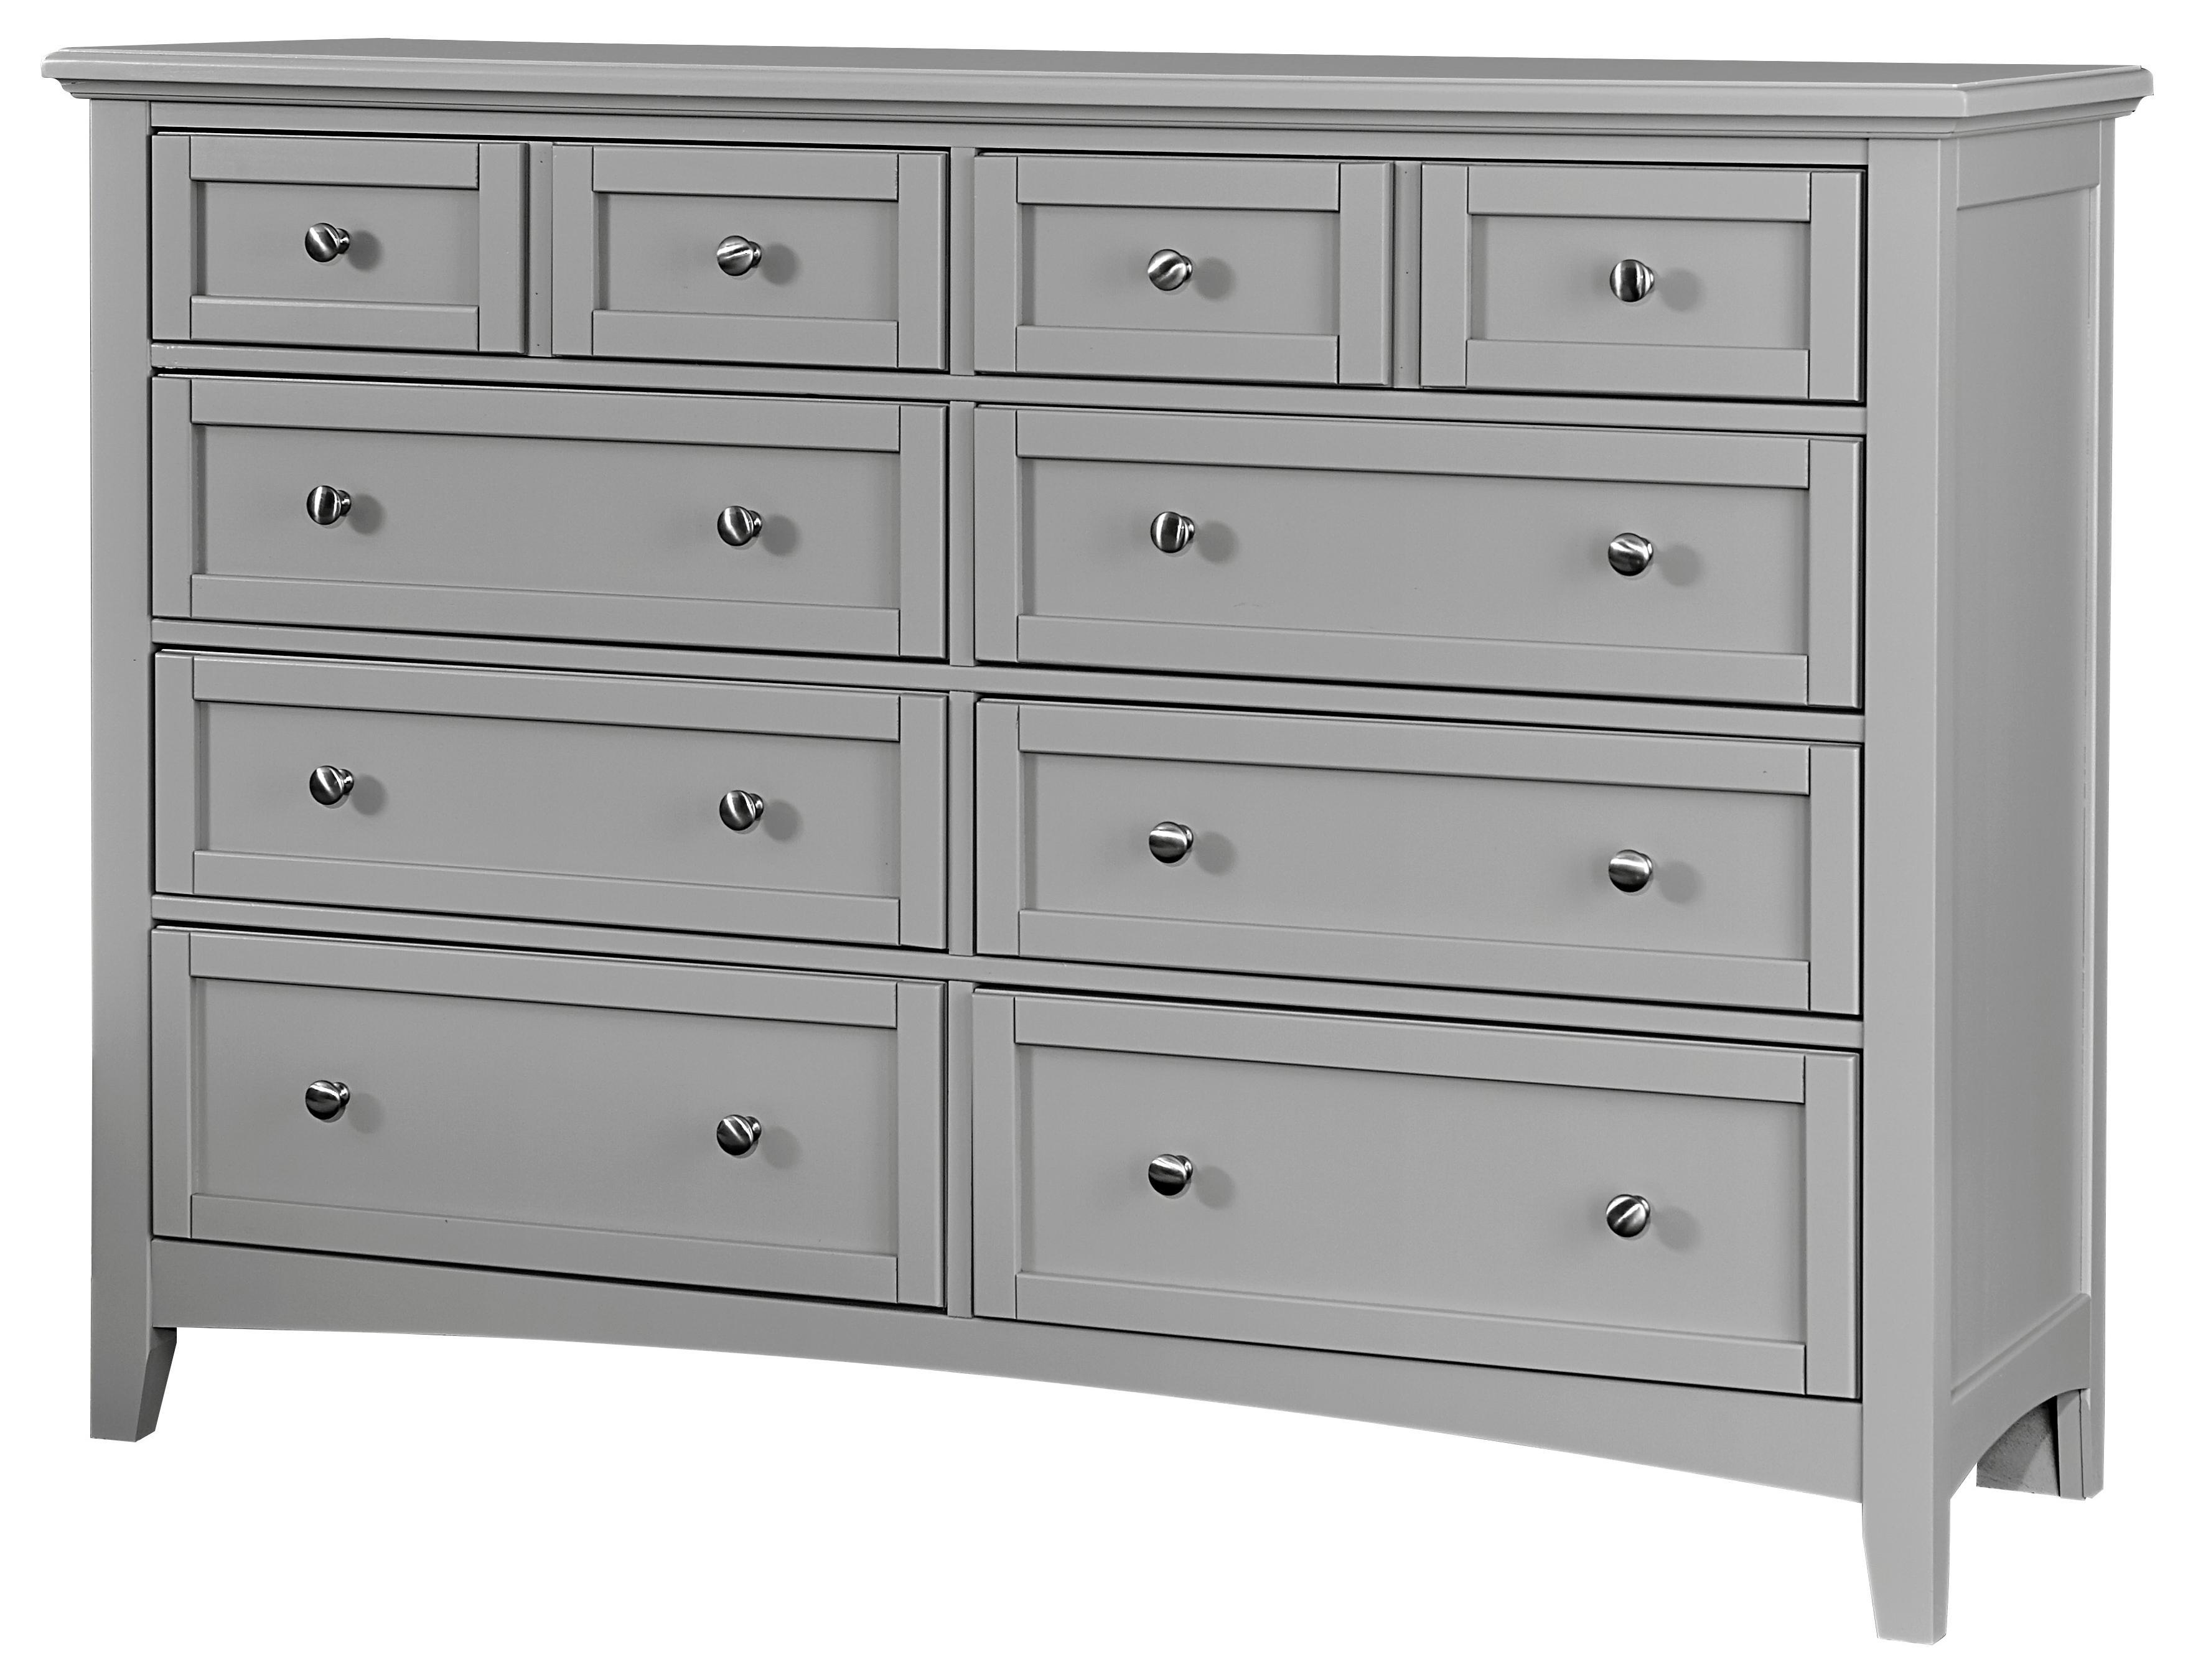 Bonanza Triple Dresser - 8 Drawers by Vaughan Bassett at Johnny Janosik